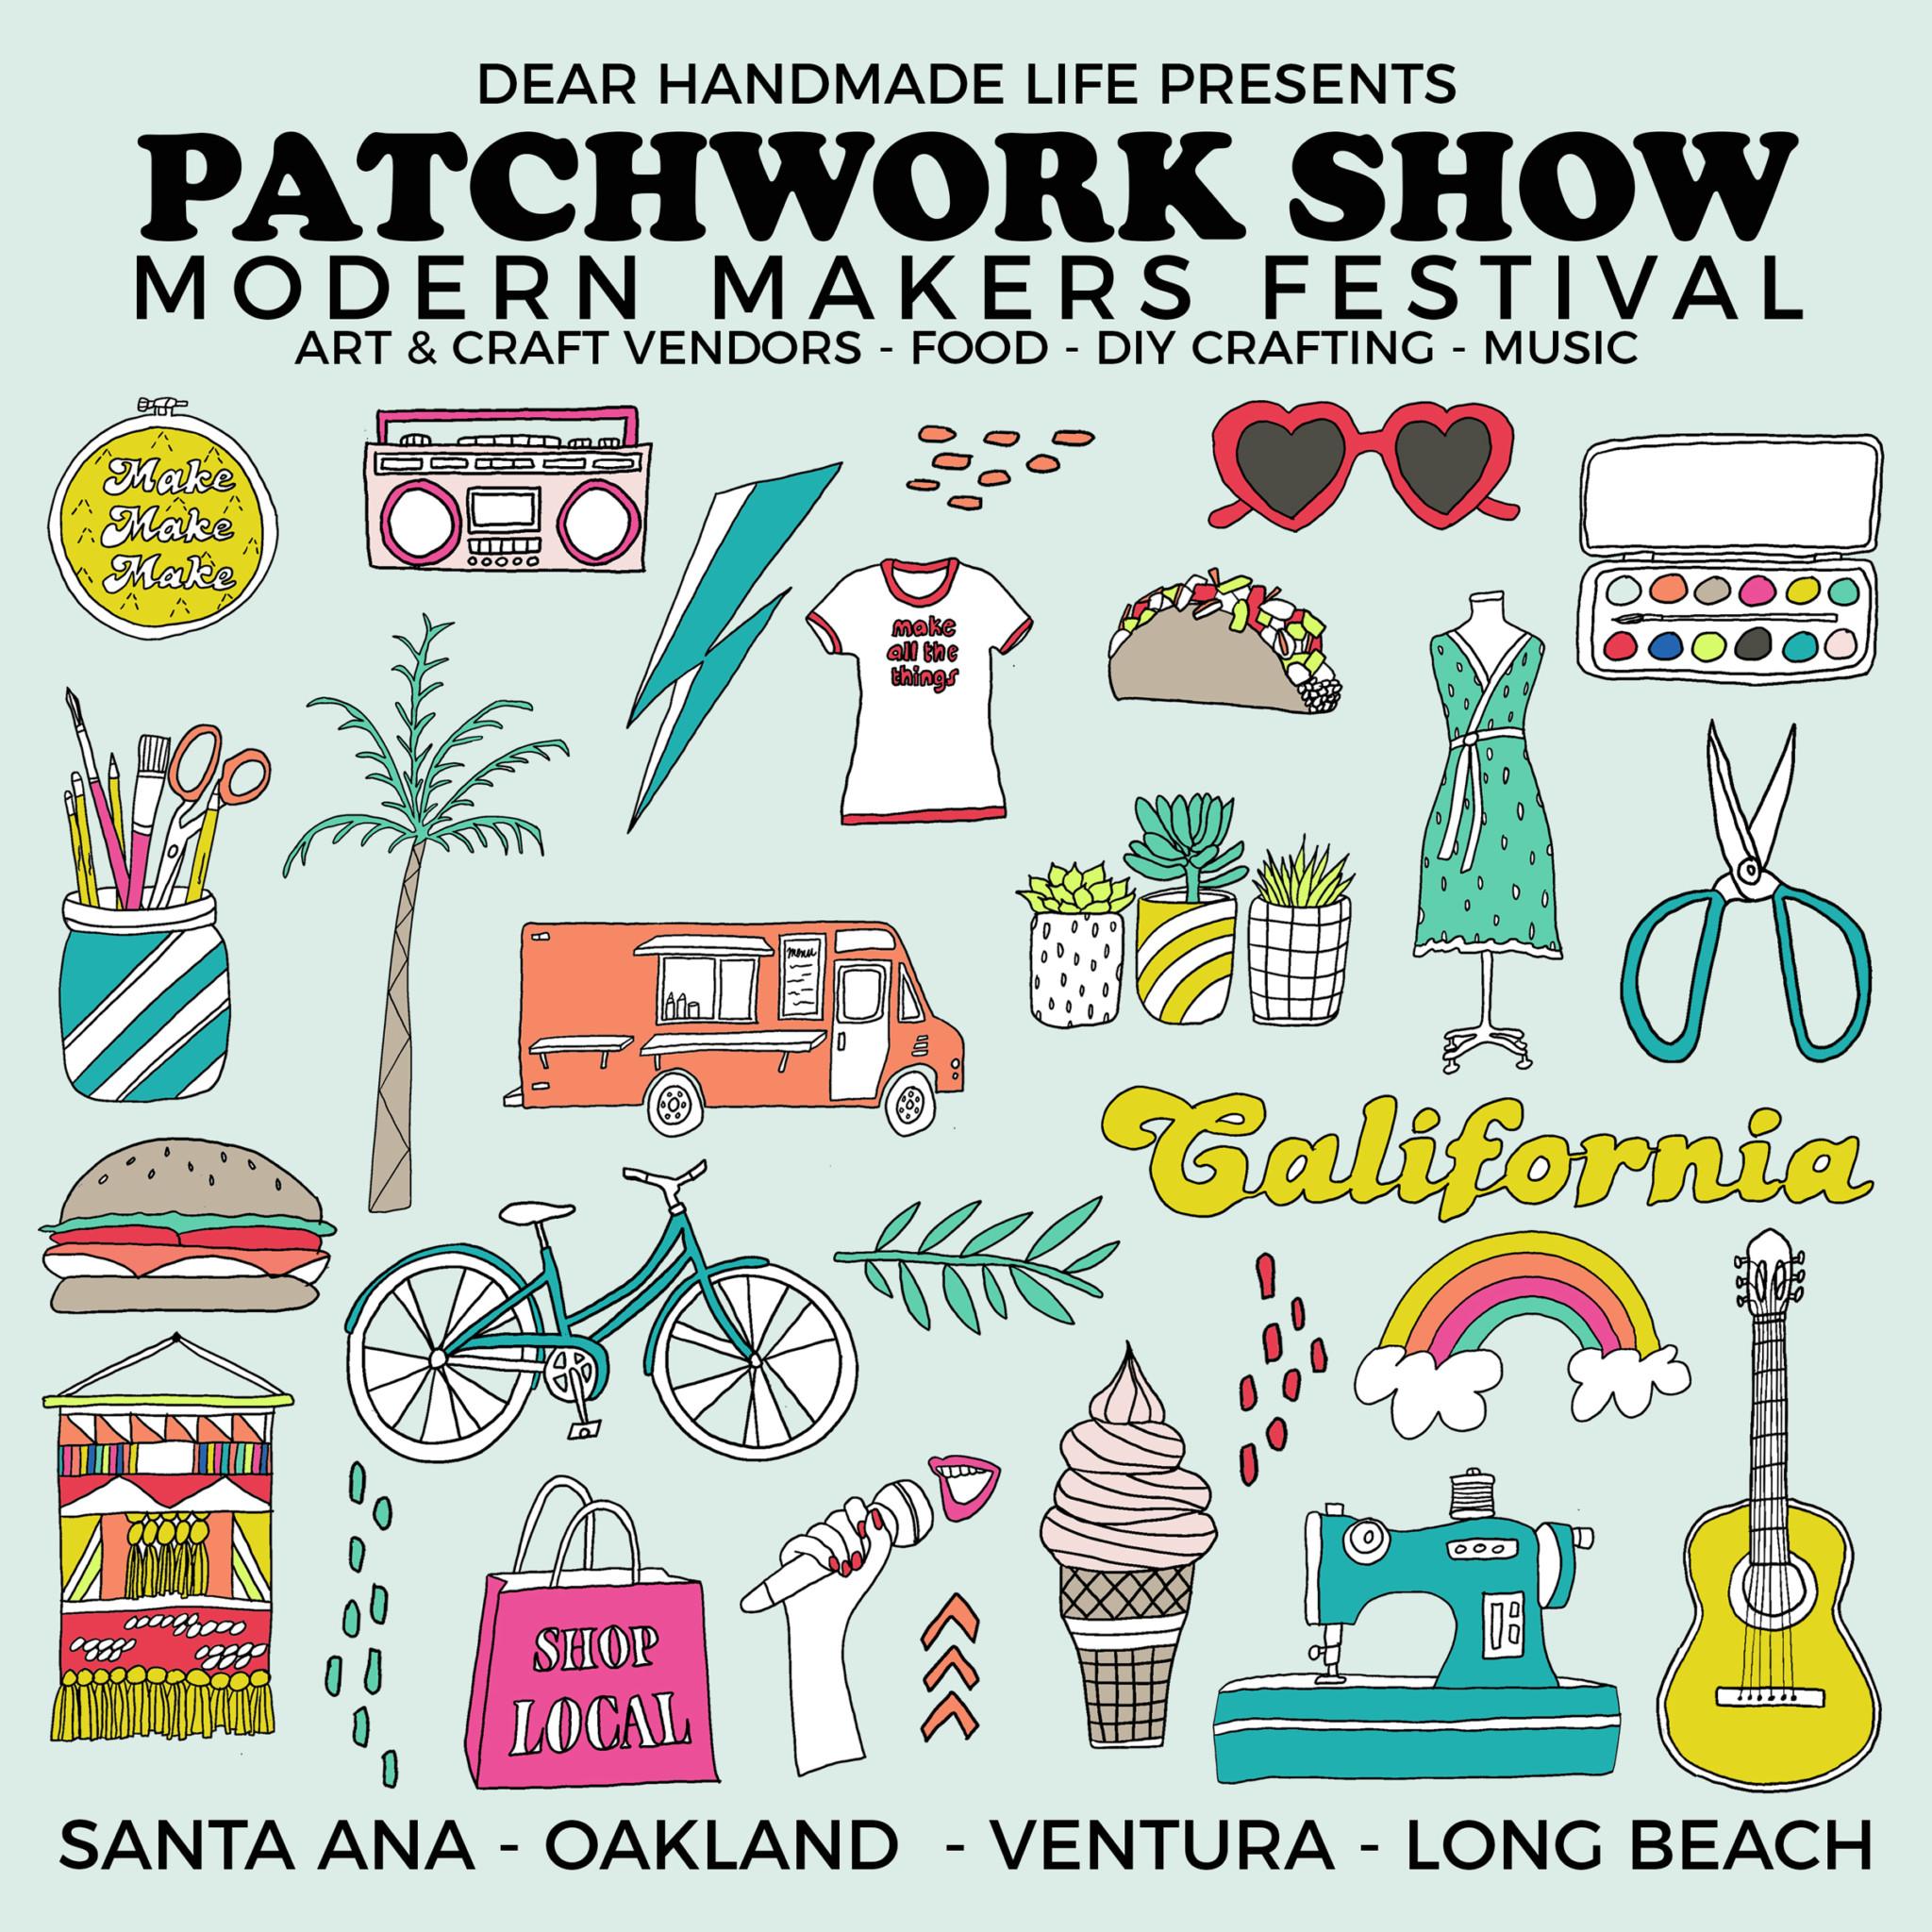 patchwork-show-spring-2019-square.jpg